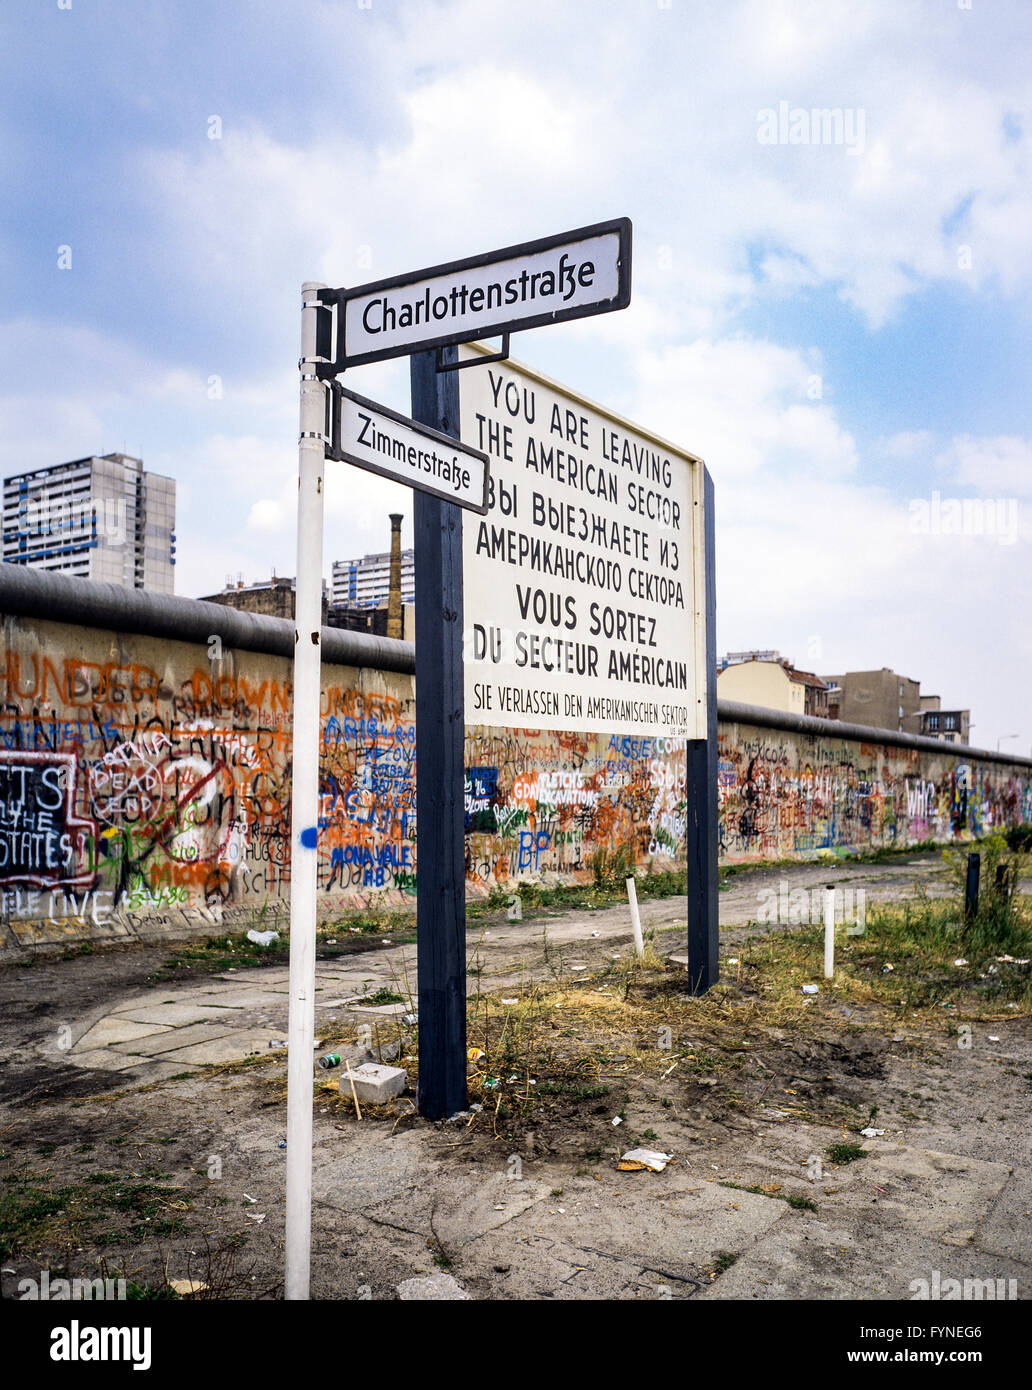 August 1986, leaving American sector warning sign, Zimmerstrasse street sign, Berlin Wall graffitis, Kreuzberg, - Stock Image